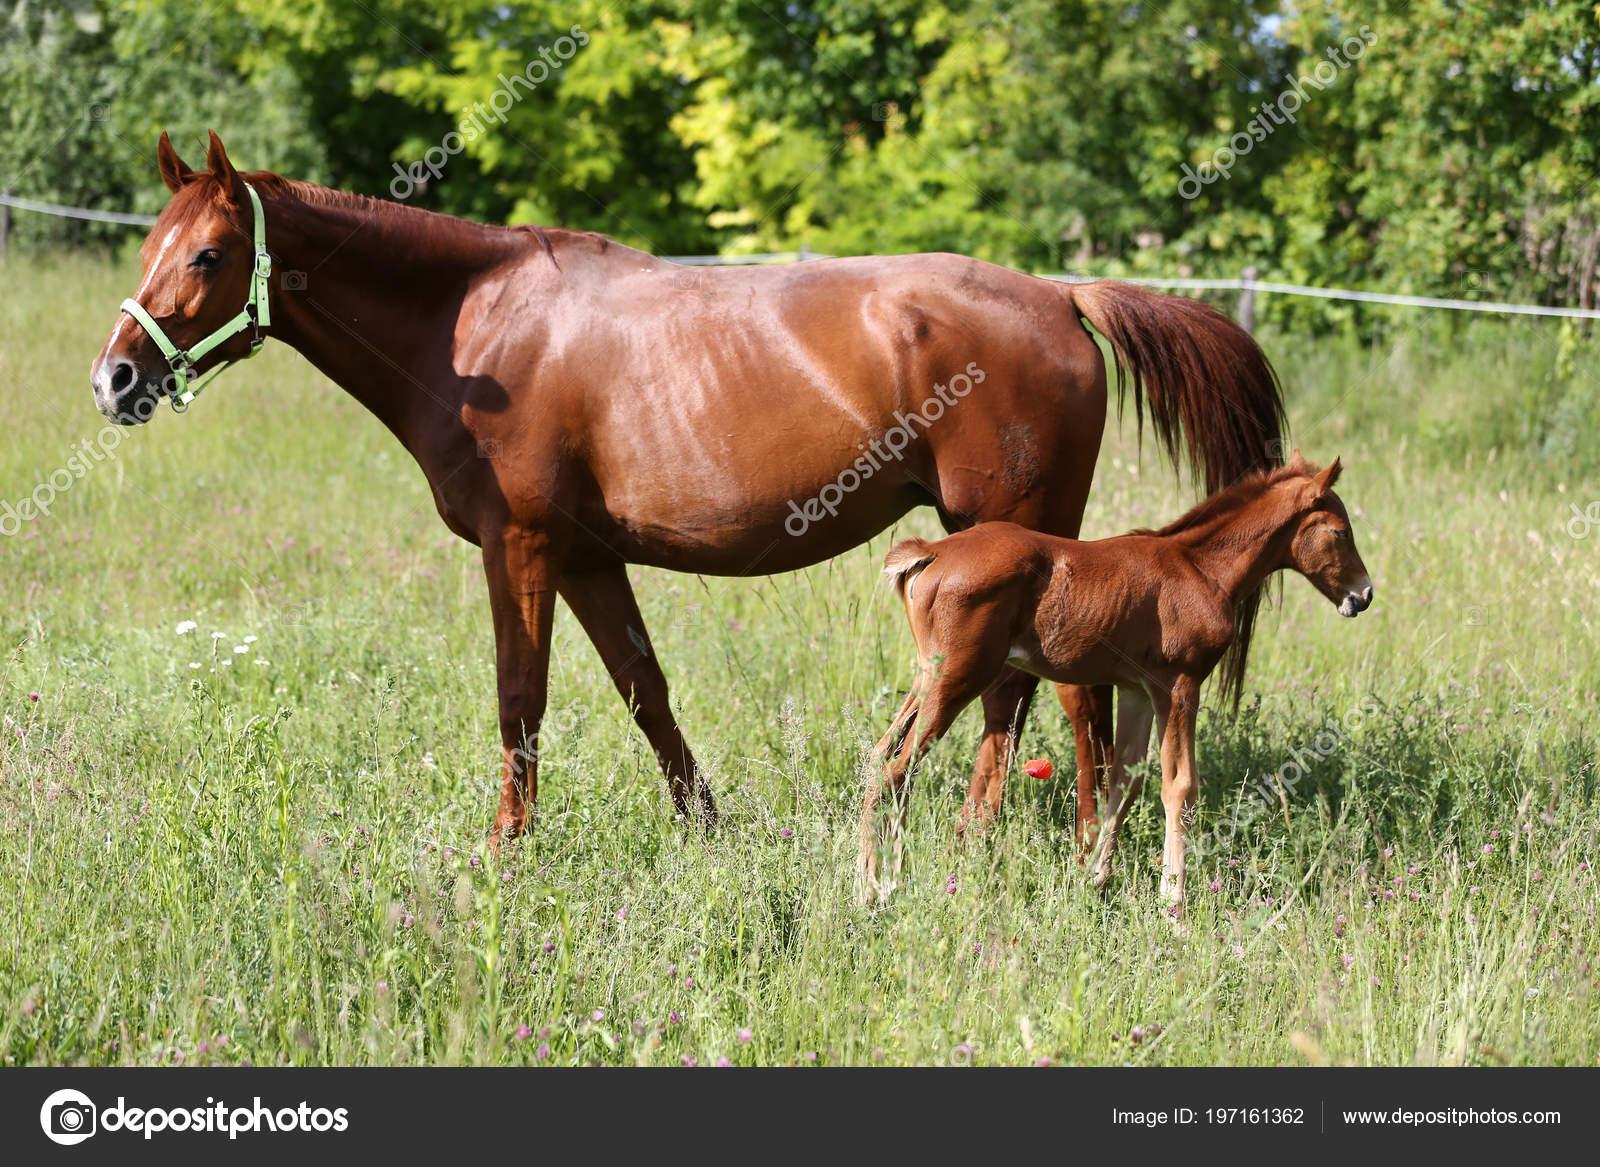 Pictures Newborn Baby Horses Mother Horse Graze Her Little Newborn Baby Horse Stock Photo C Accept001 197161362